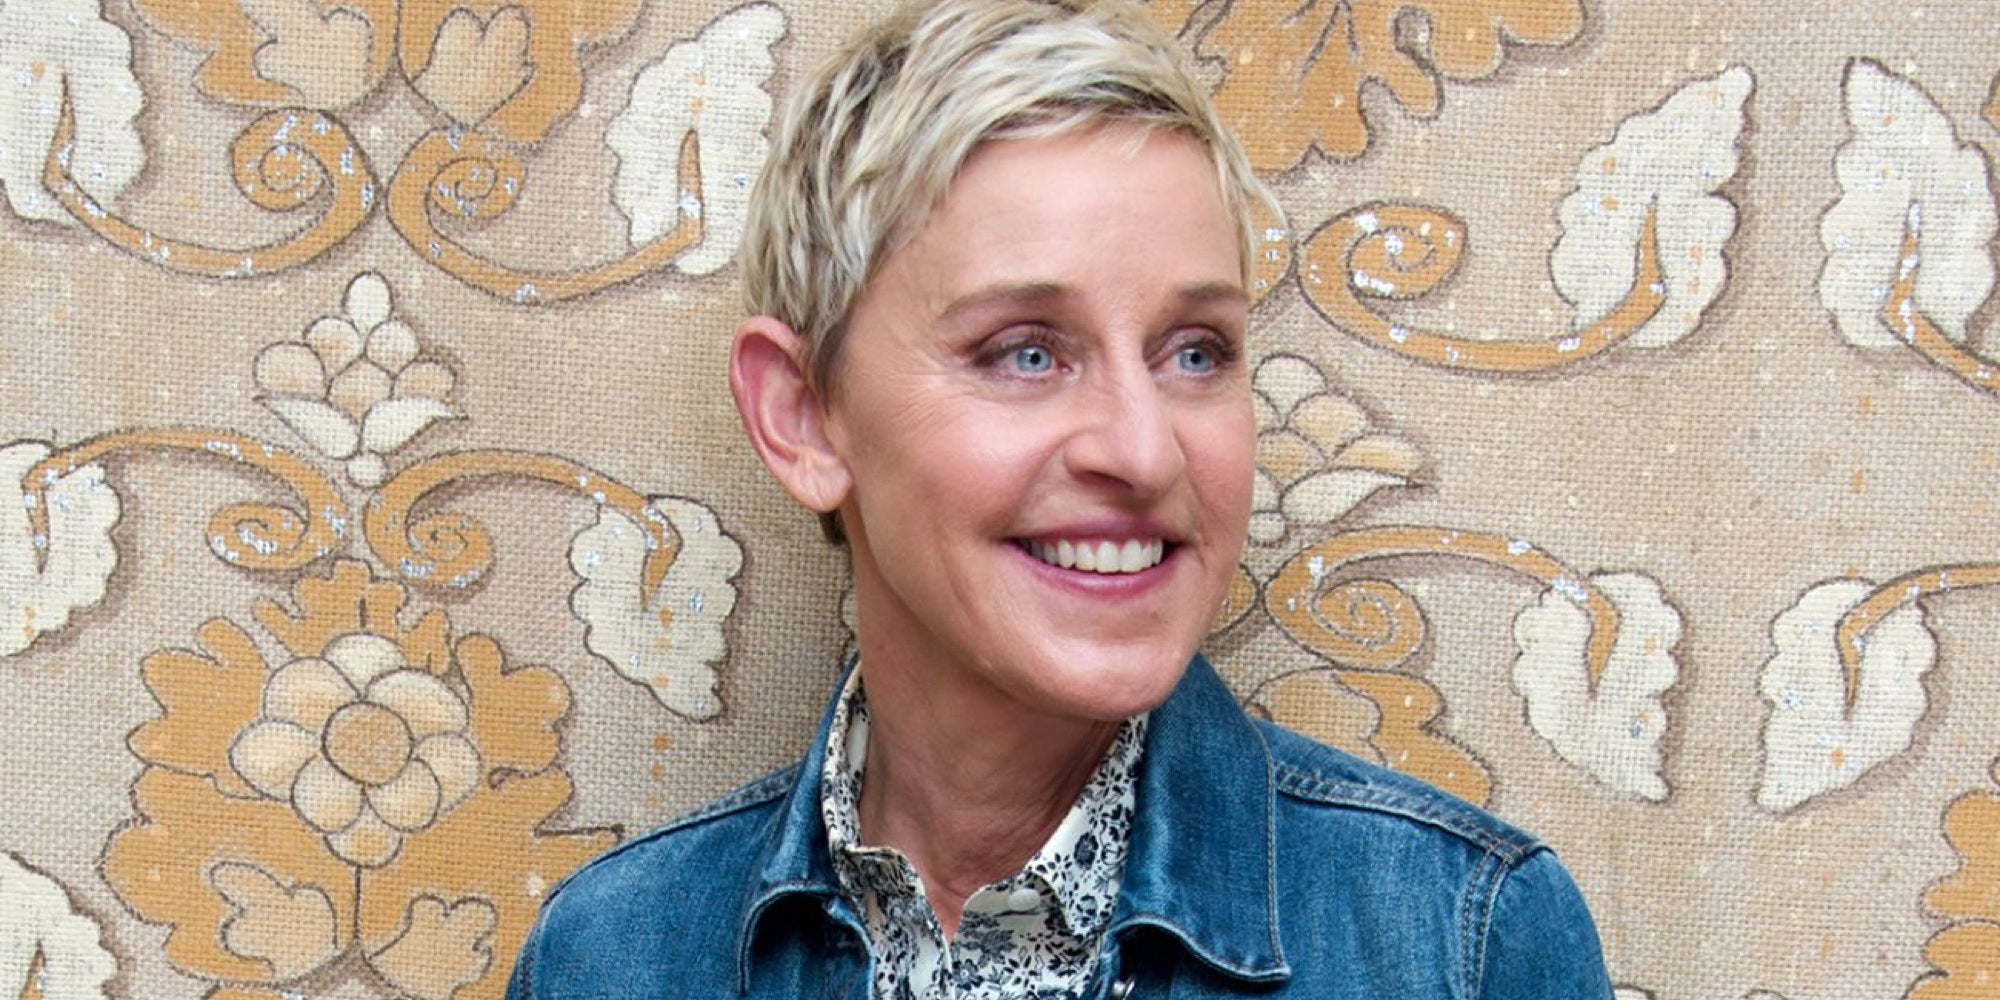 12 Upbeat Ellen DeGeneres Quotes to Put You in a Good Mood